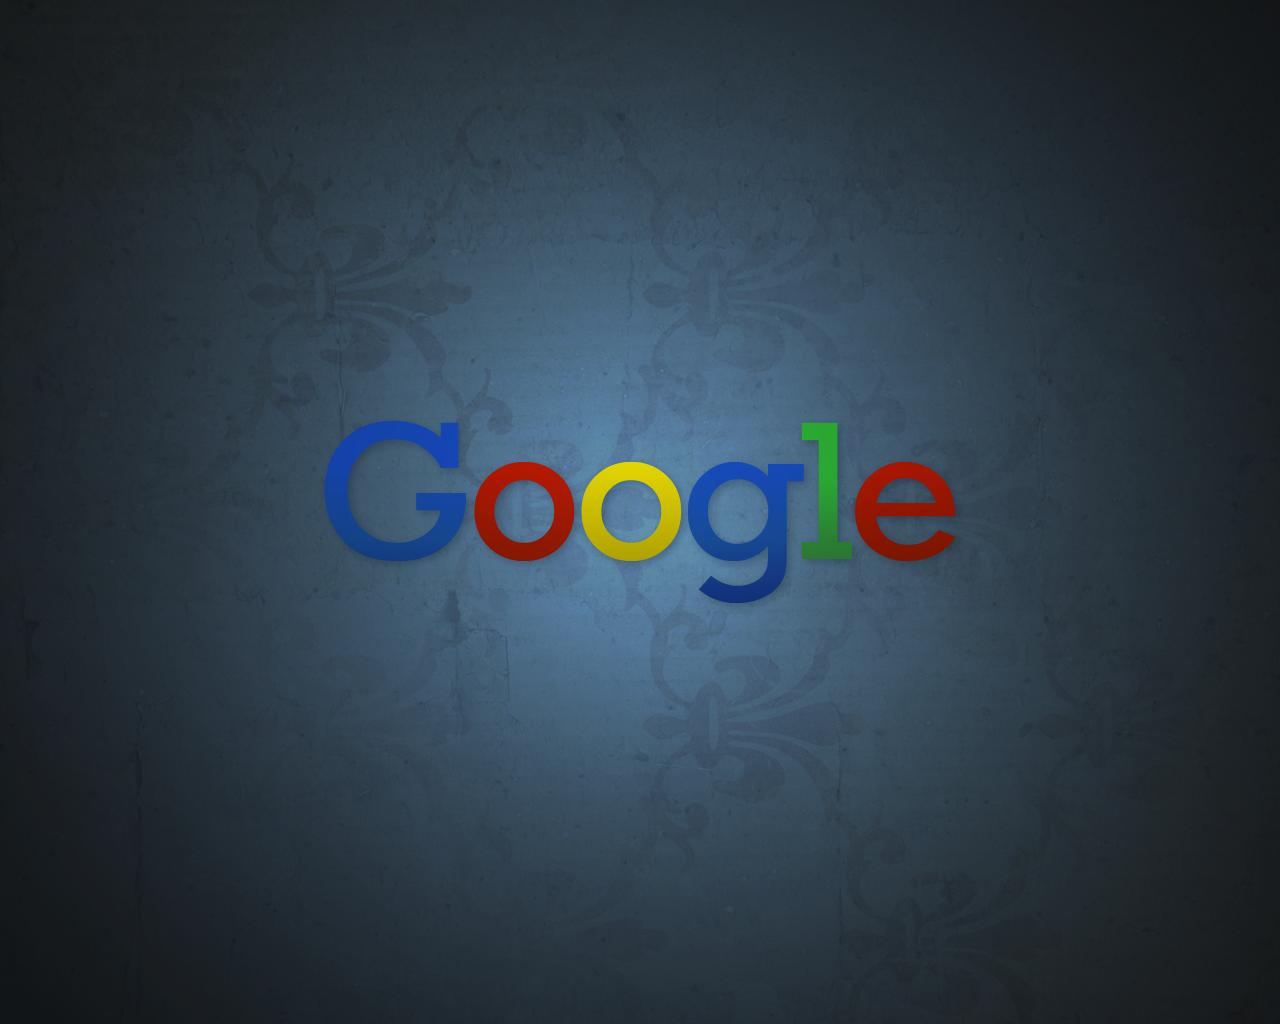 Wallpapers HD Google 1280x1024